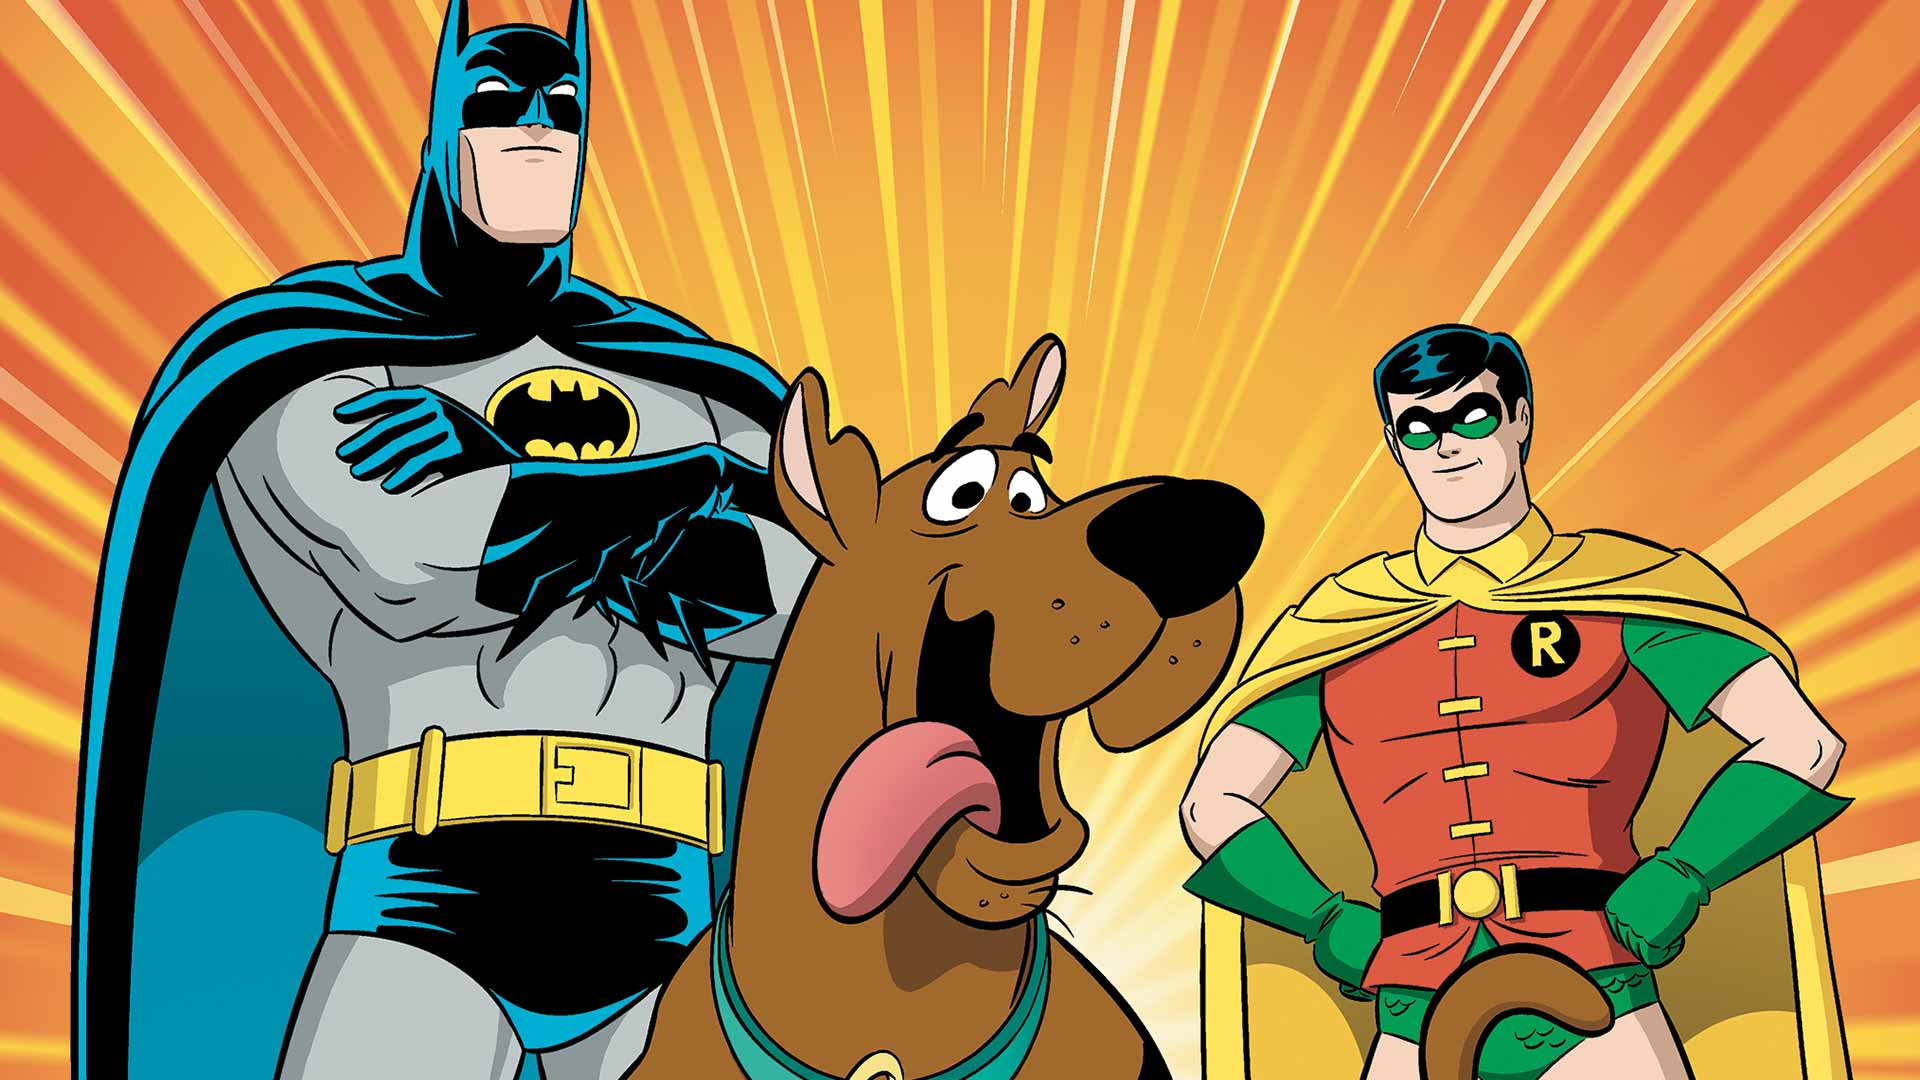 Scooby doo rencontre batman et robin